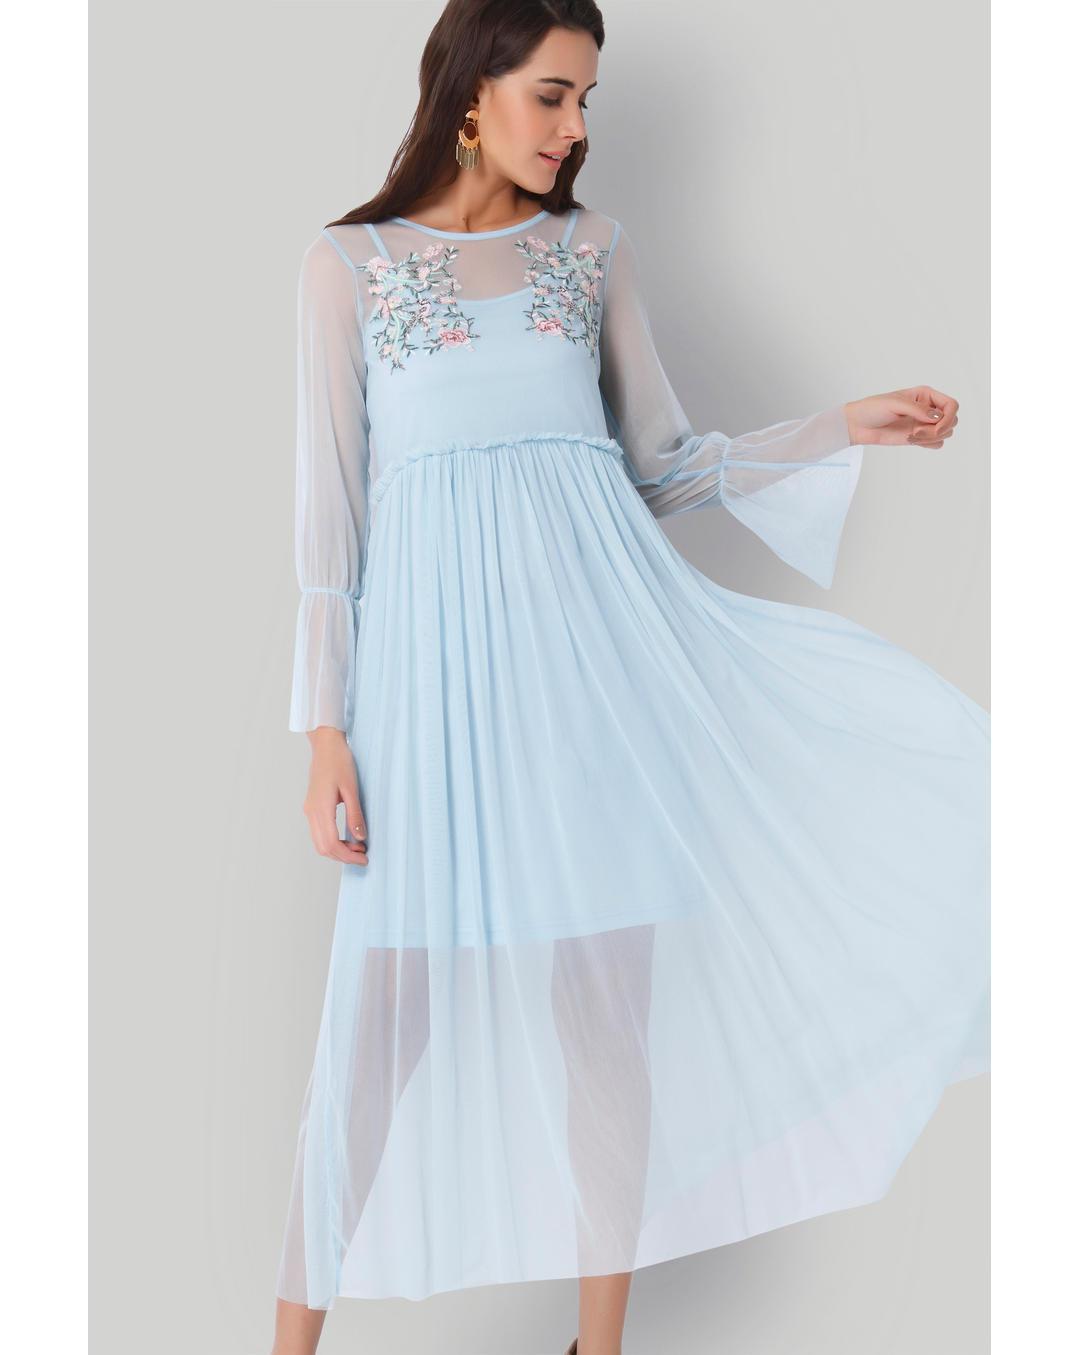 70292e5cbd Buy Vero Moda Light Blue Floral Embroidered Net Midi Dress Online ...